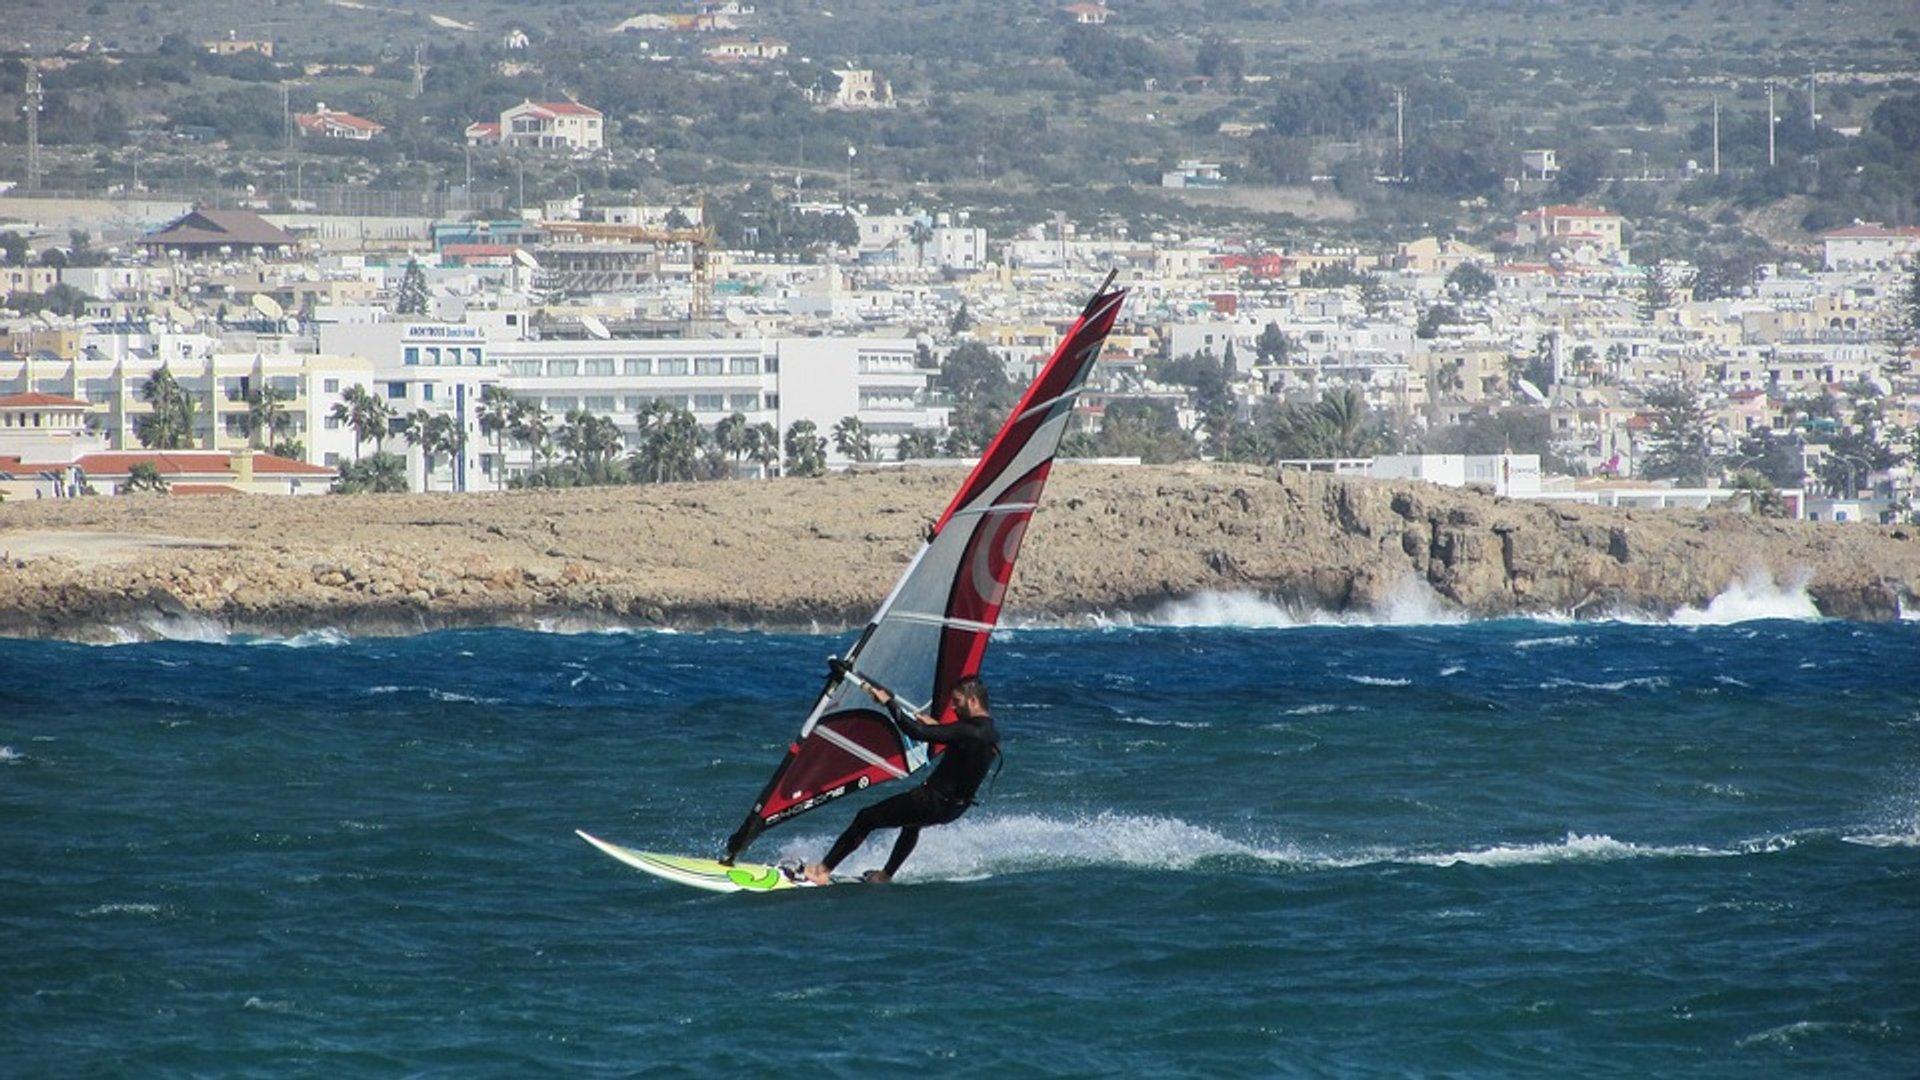 Windsurfing off the coast near Ayia Napa, Cyprus 2020